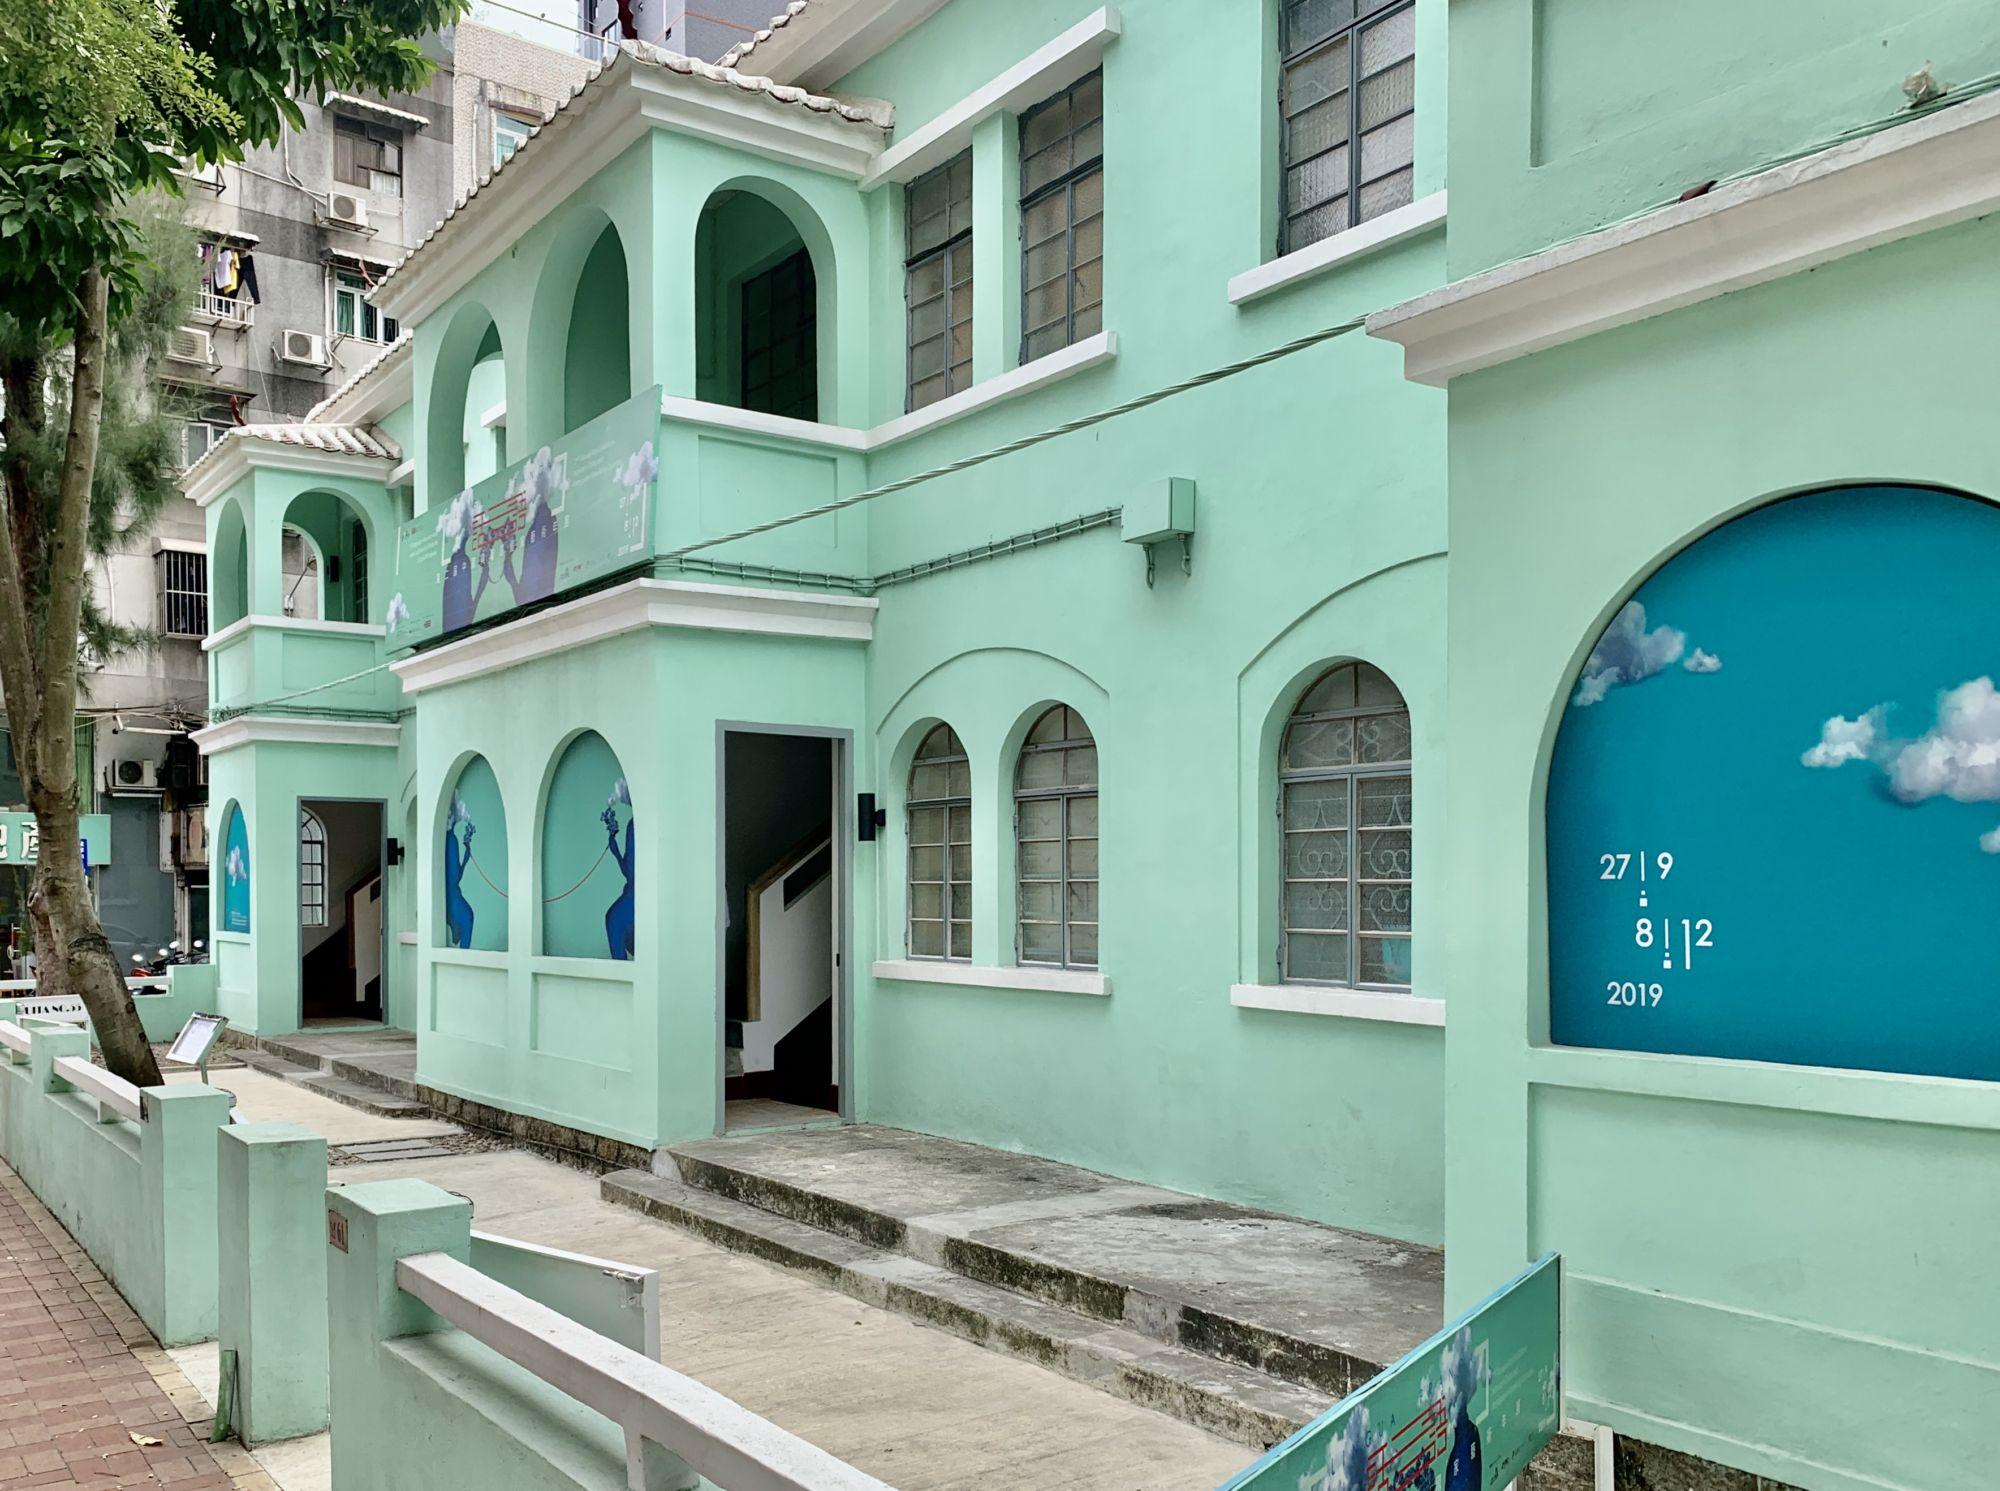 Green Town Houses at Coronel Mesquita Exterior View Macau Lifestyle